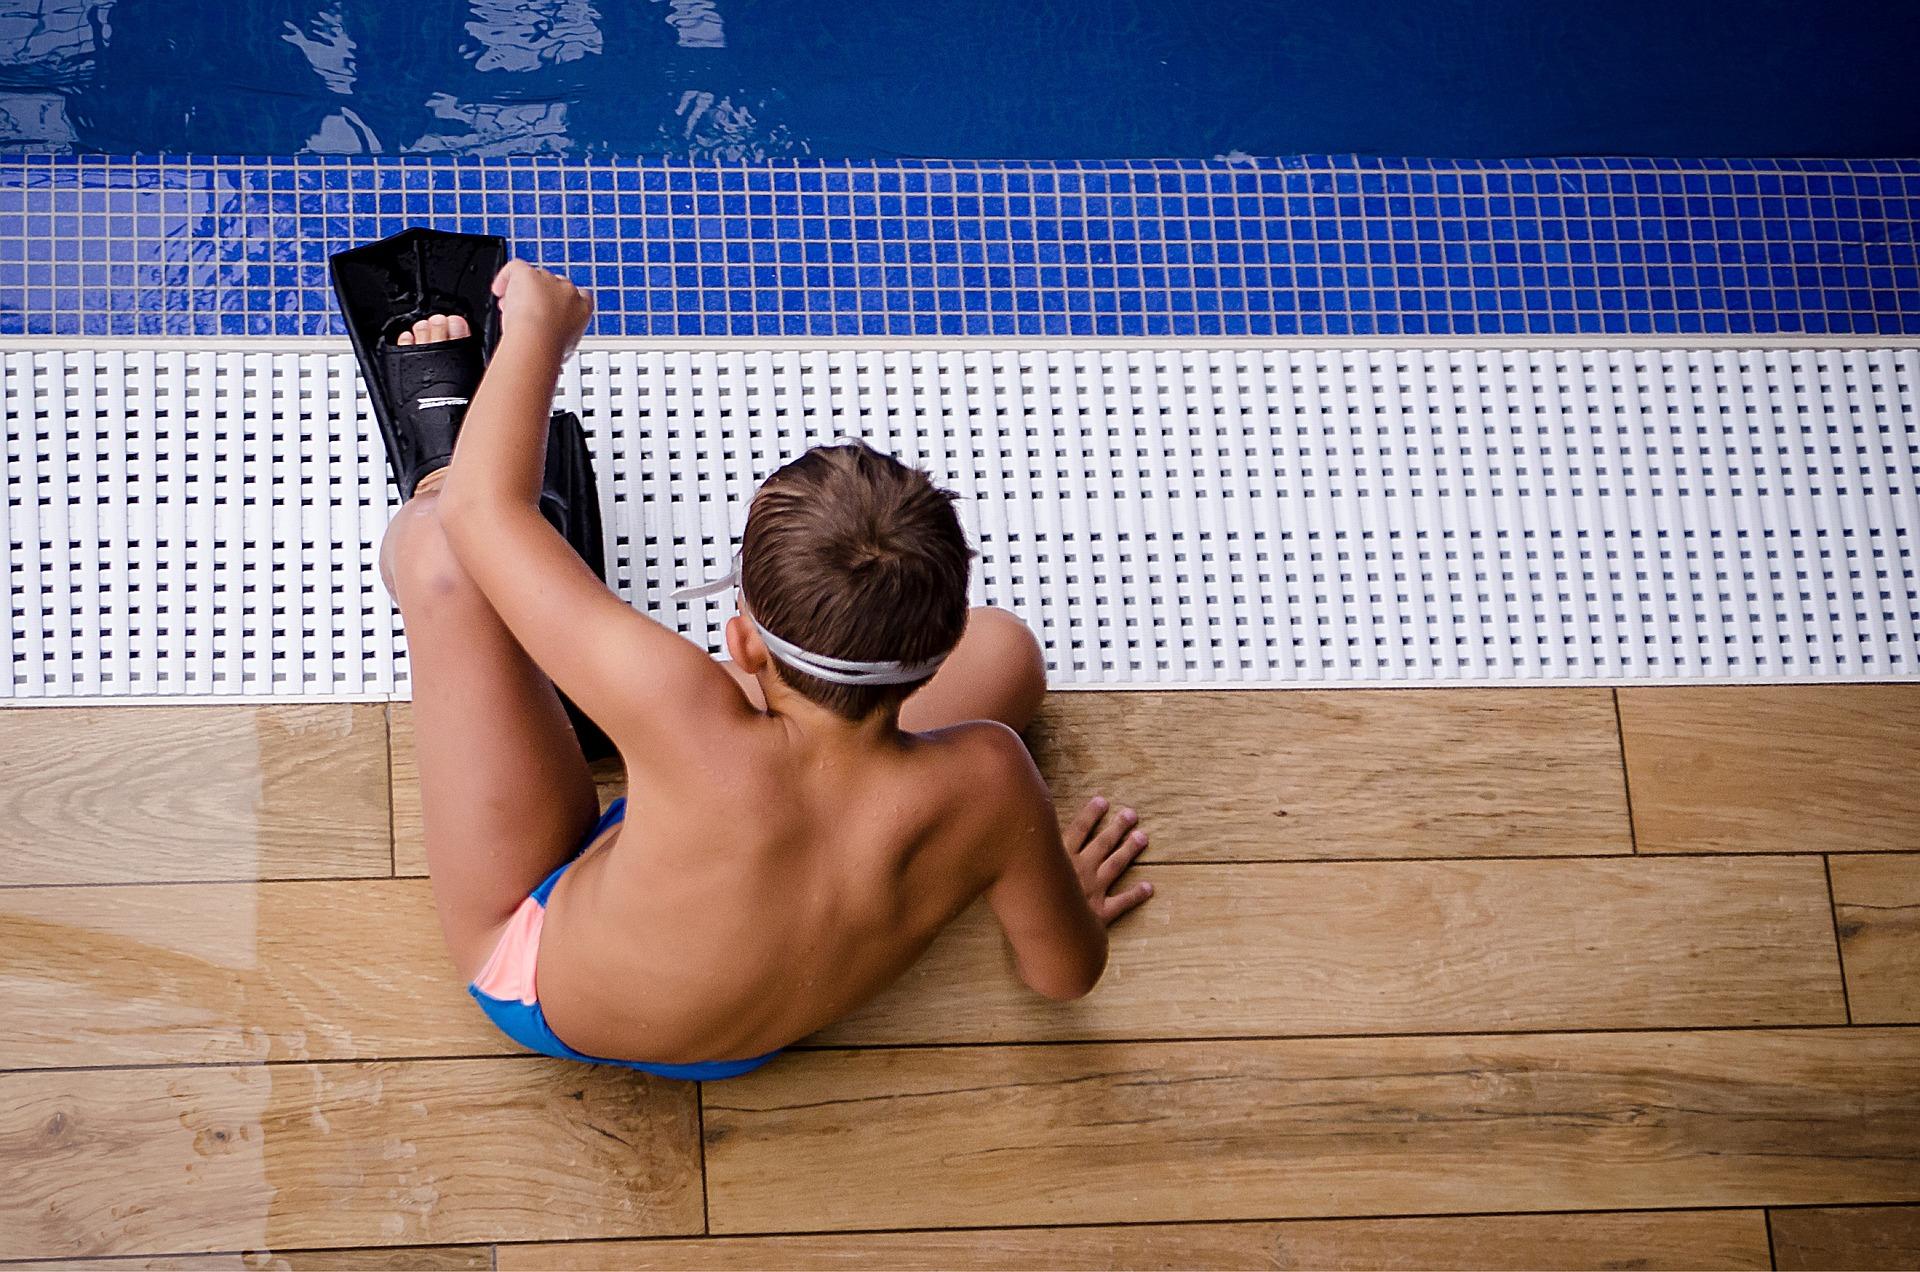 sport pool children